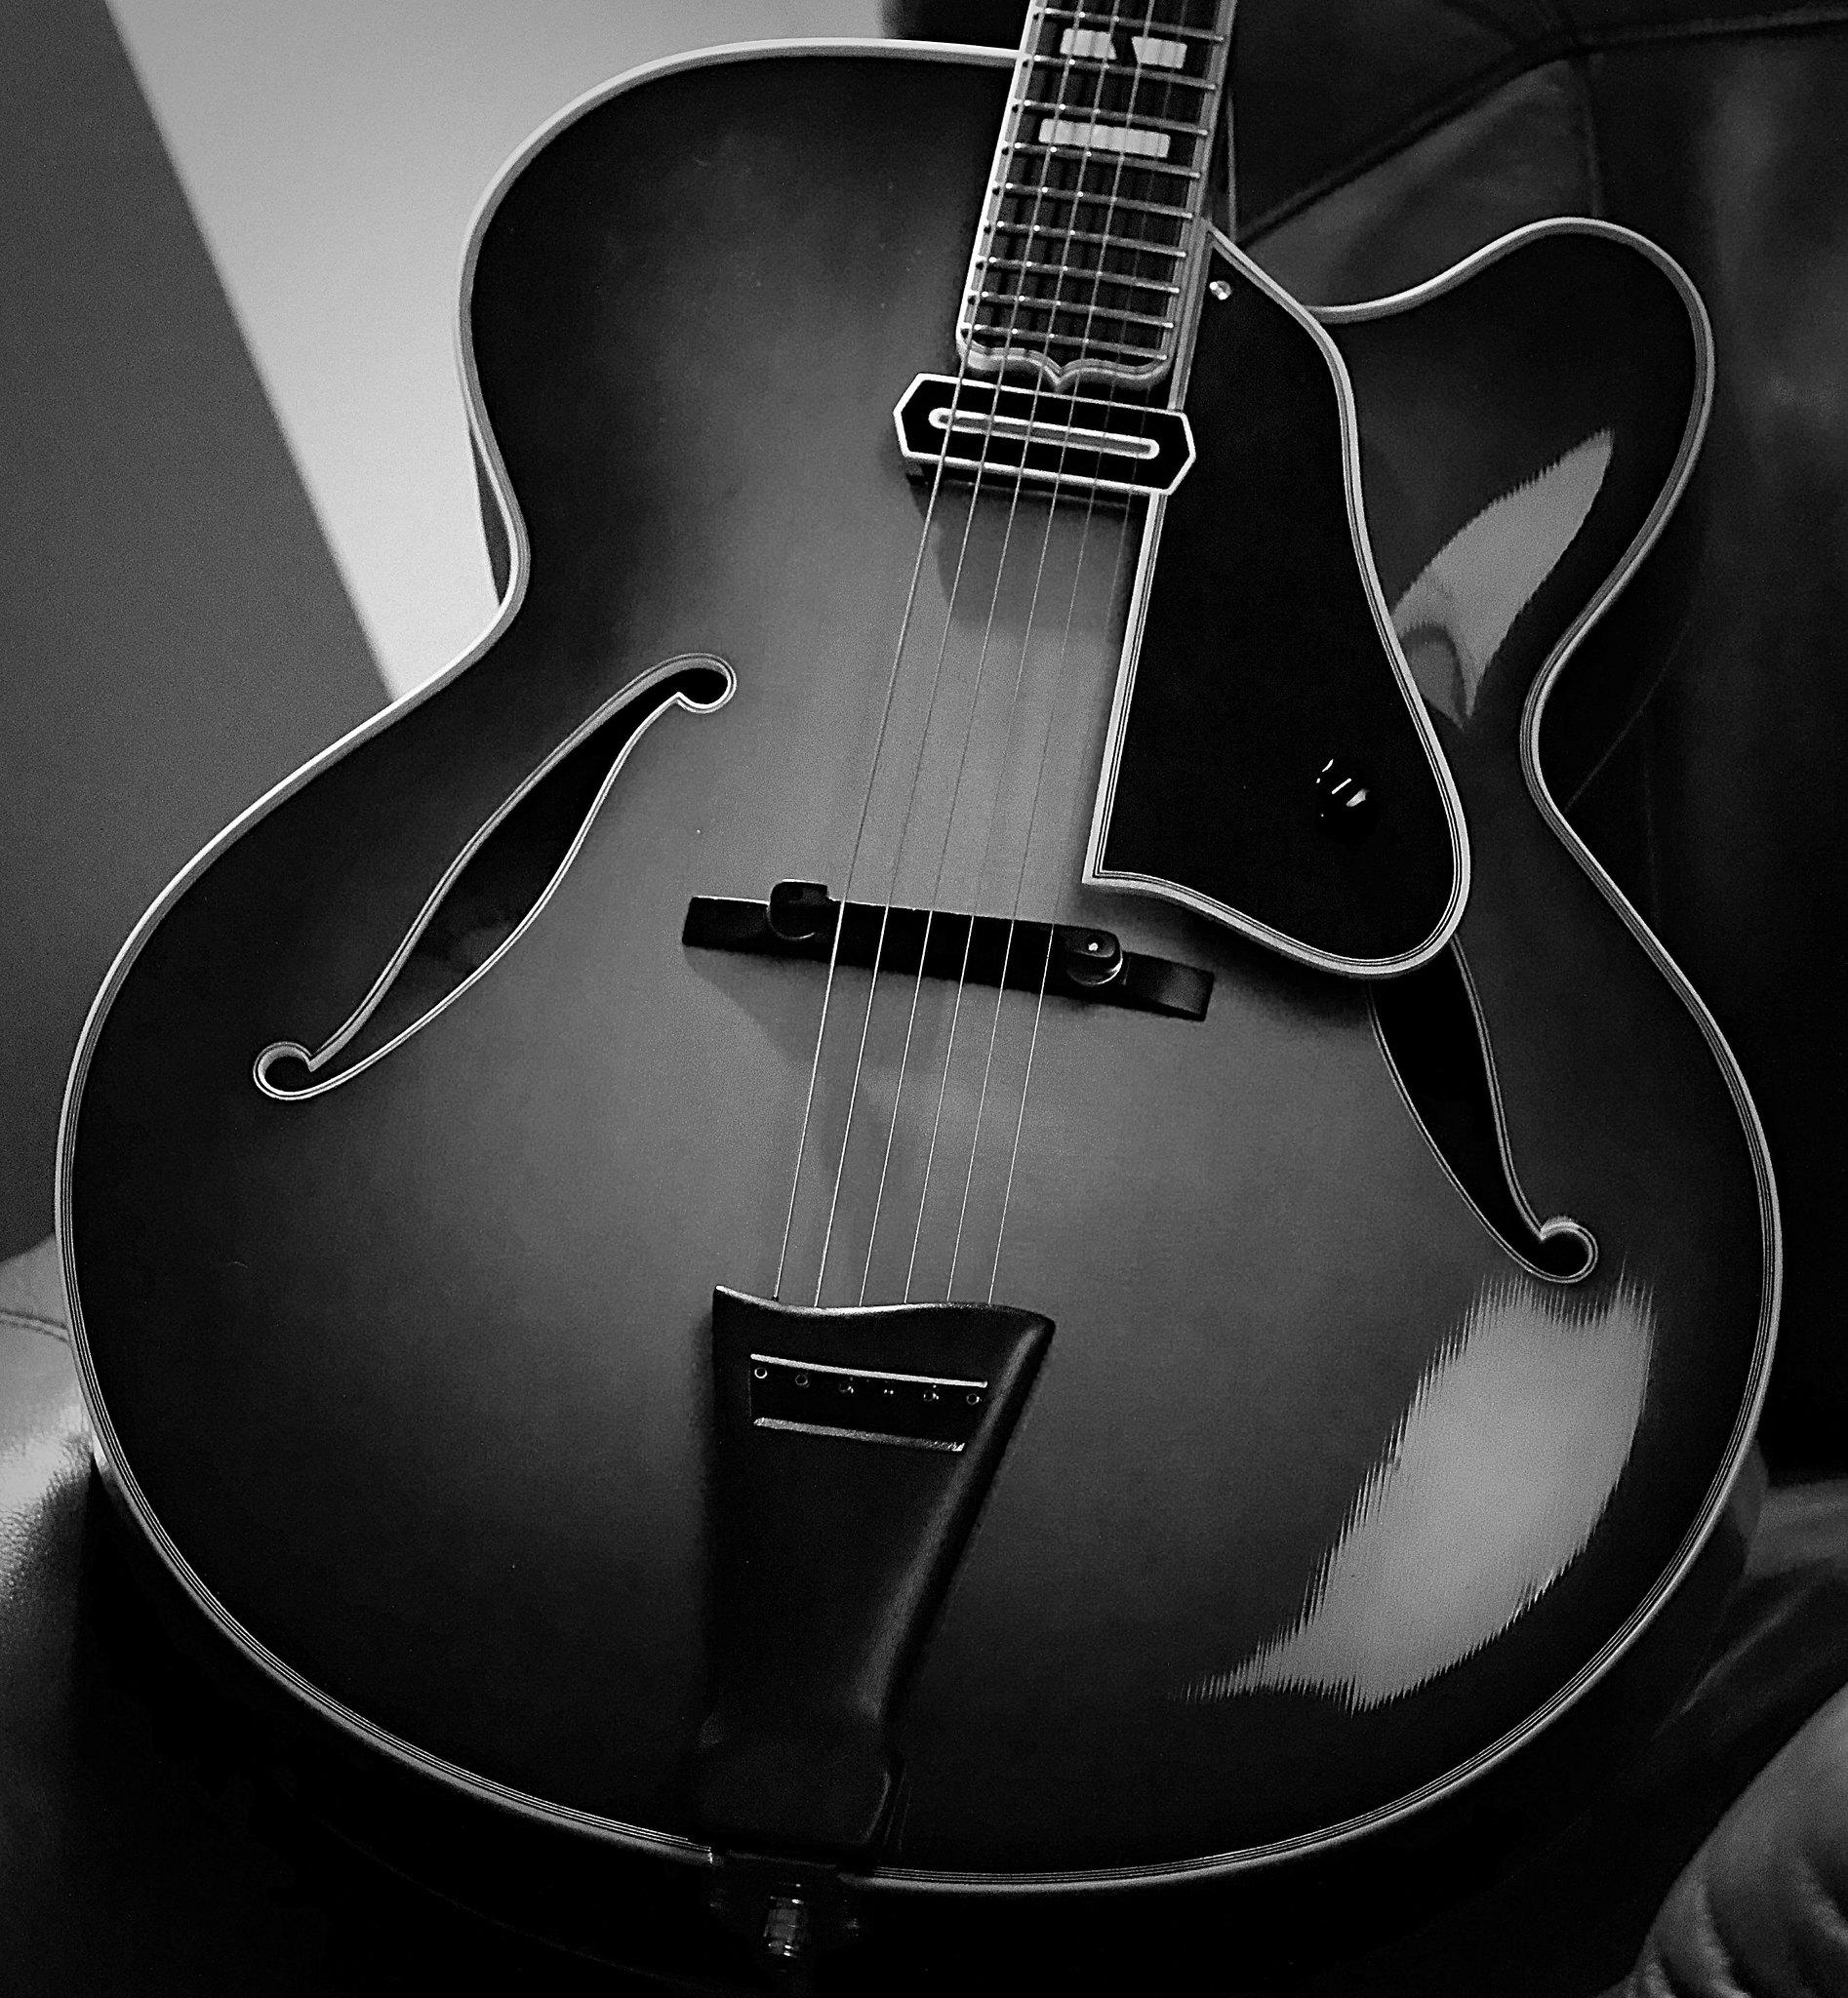 Mr Wu archtops and Hotman Guitars?-b46b74fe-a46a-4130-9cfa-7ed0c81df316-jpeg